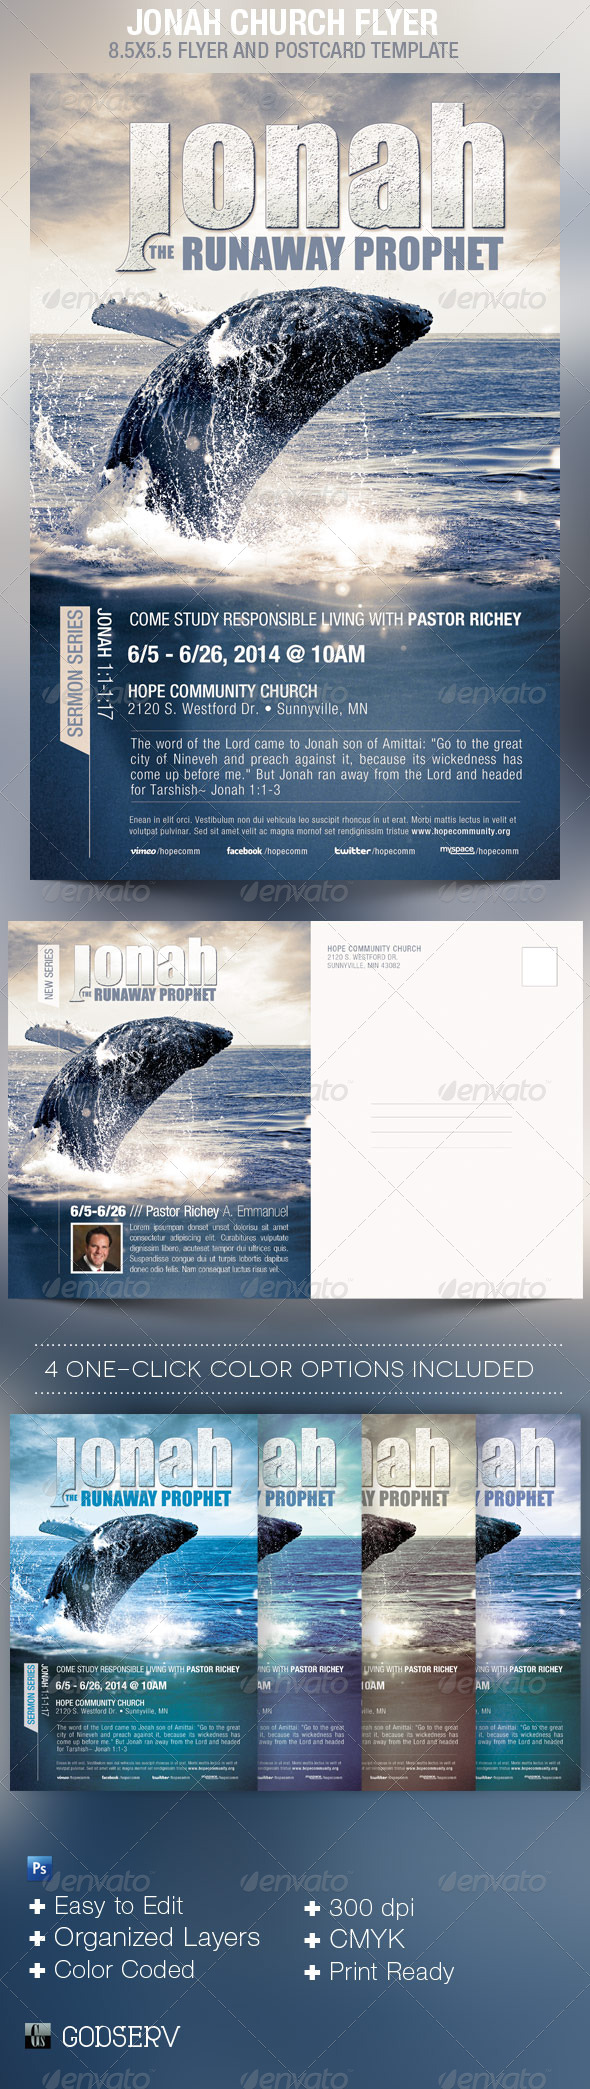 GraphicRiver Jonah Church Flyer Template 4289252